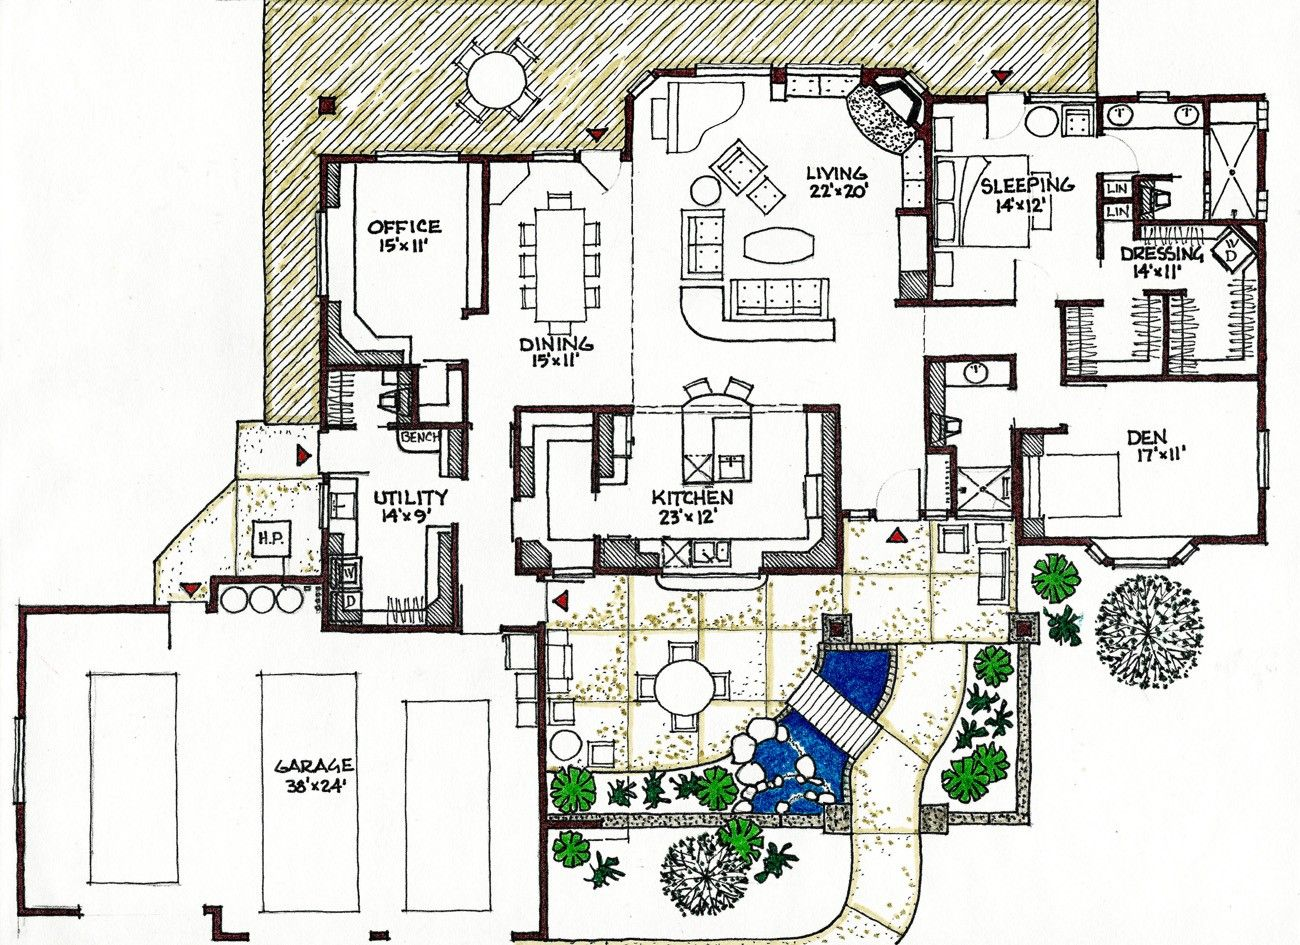 Passive House Design Nz Passive House Design Passive Solar House Plans Solar House Plans